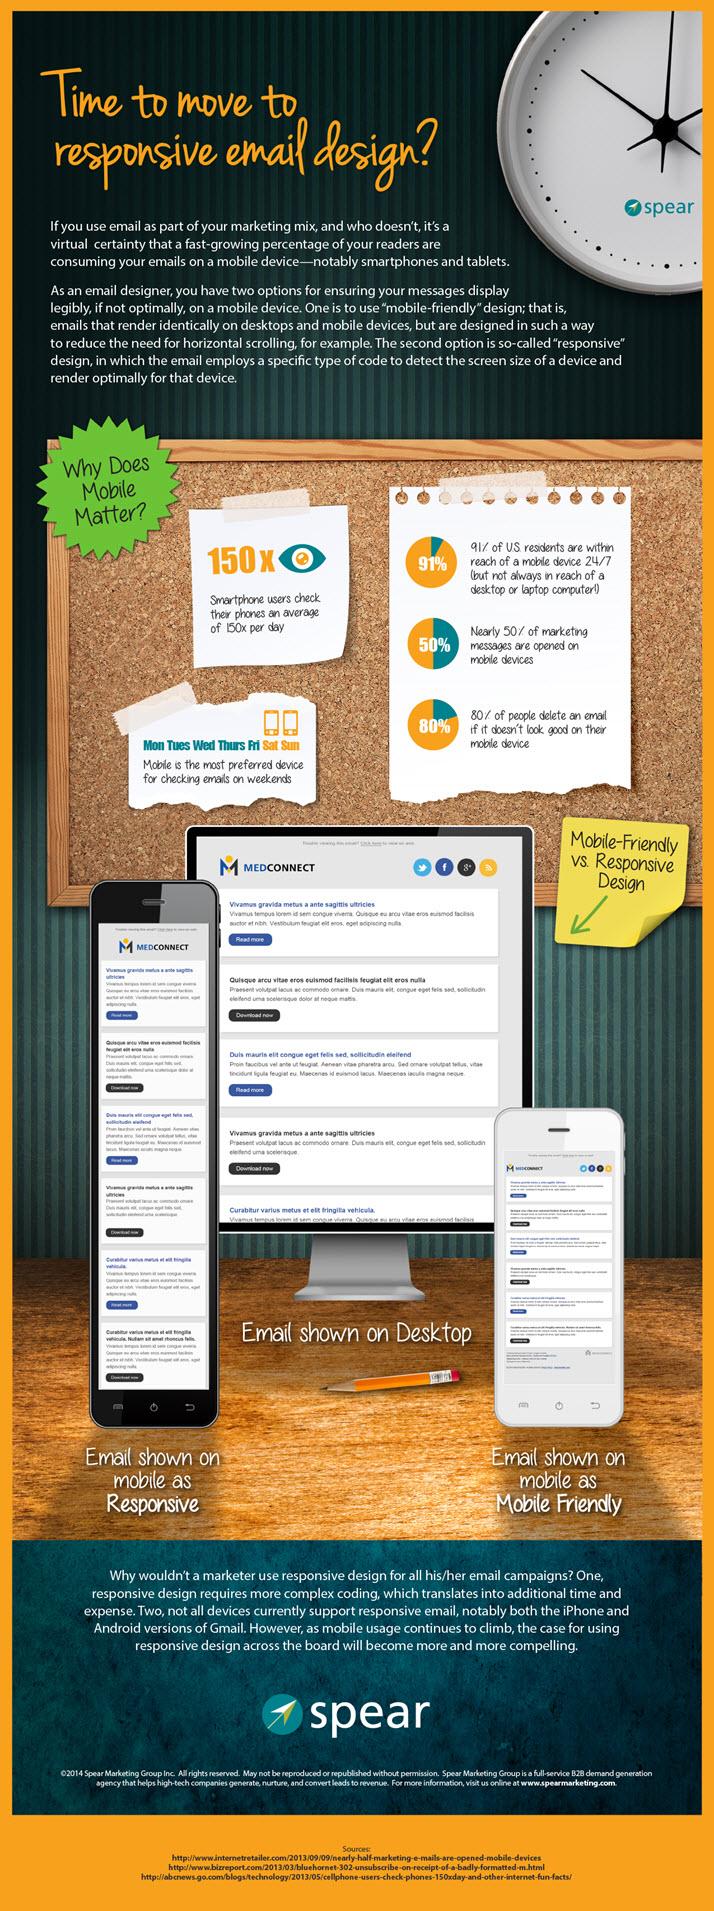 Responsive Versus Mobile Friendly Email Design